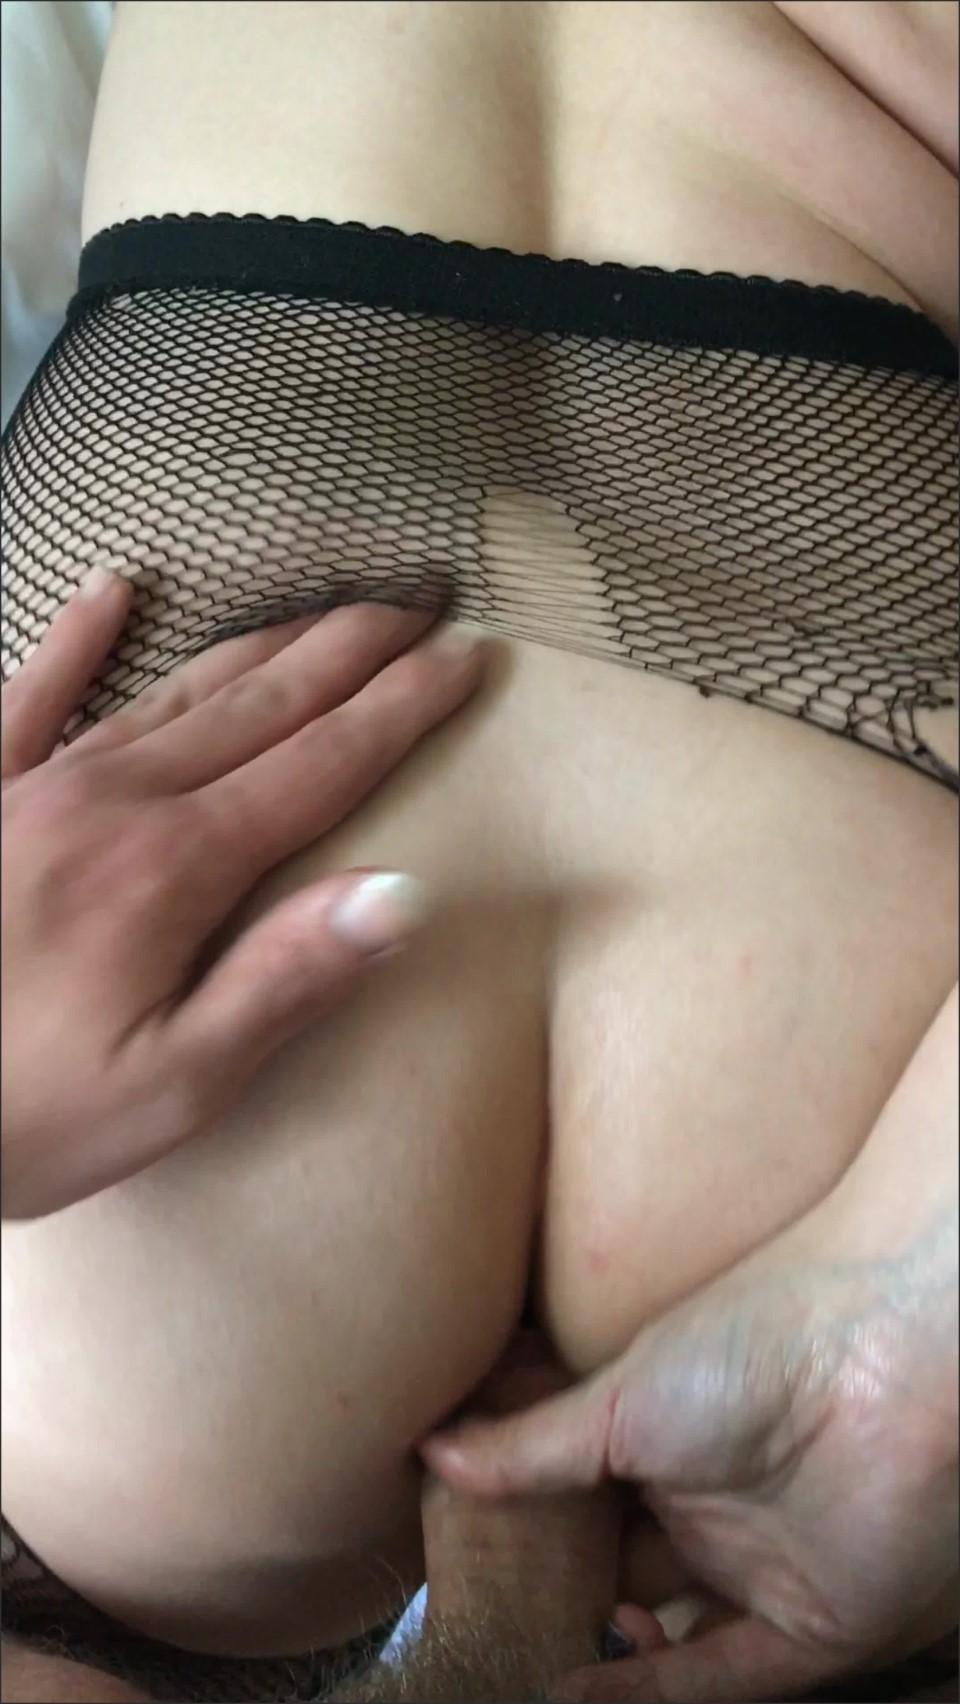 [] Damnedestcreature Amateur Pov Iphone Sex Tape DamnedestCreature - Manyvids-00:03:55 | Size - 929,2 MB